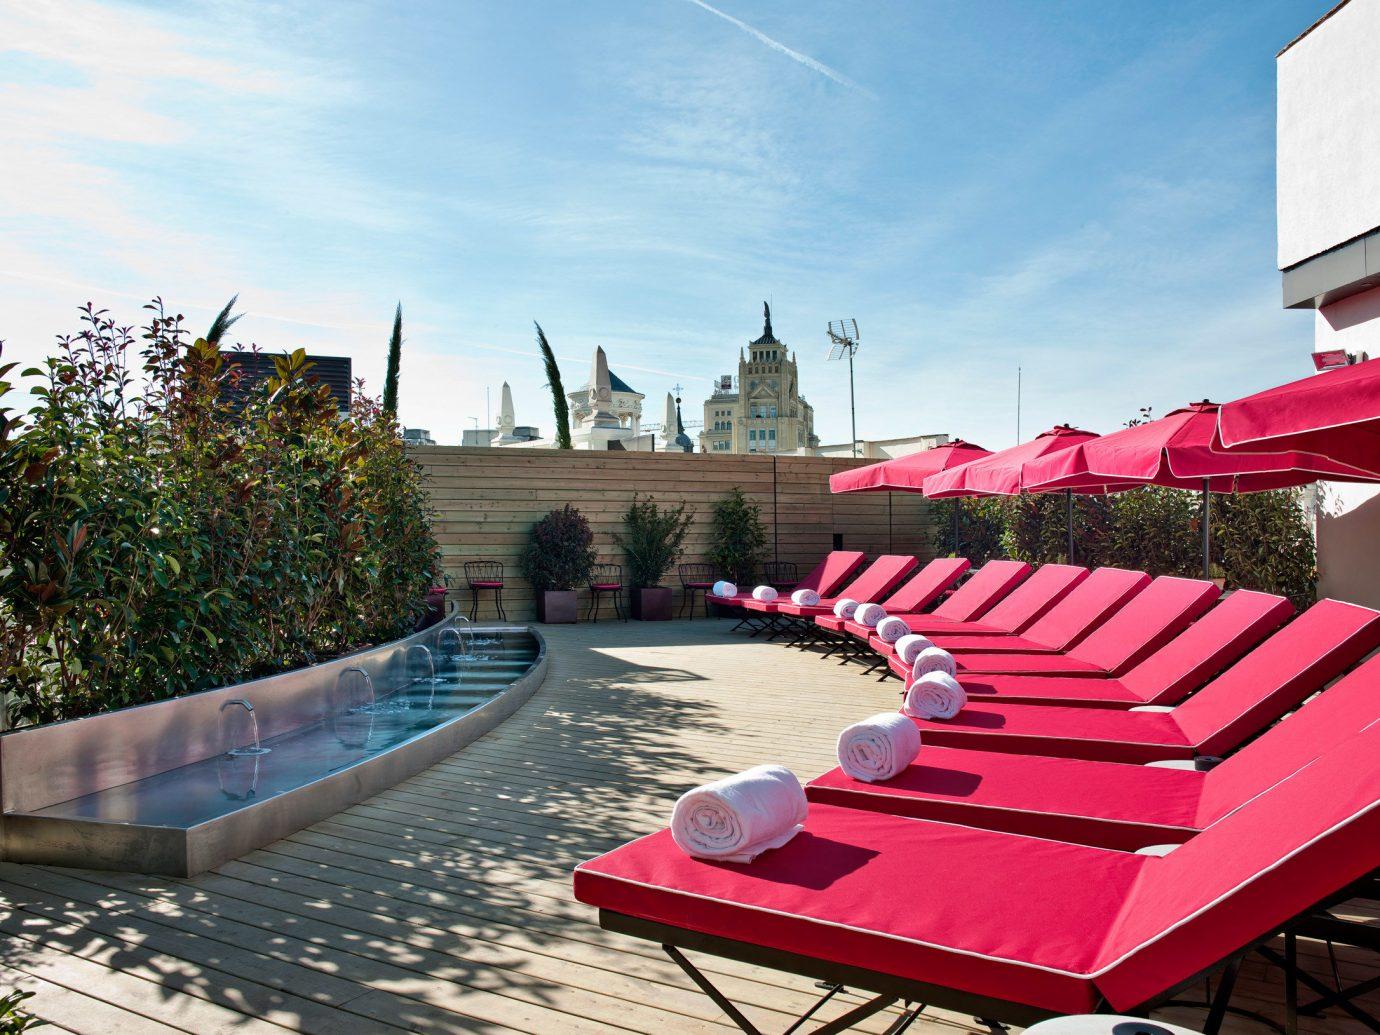 Hotels Madrid Spain sky outdoor ground leisure red swimming pool vacation Resort estate walkway